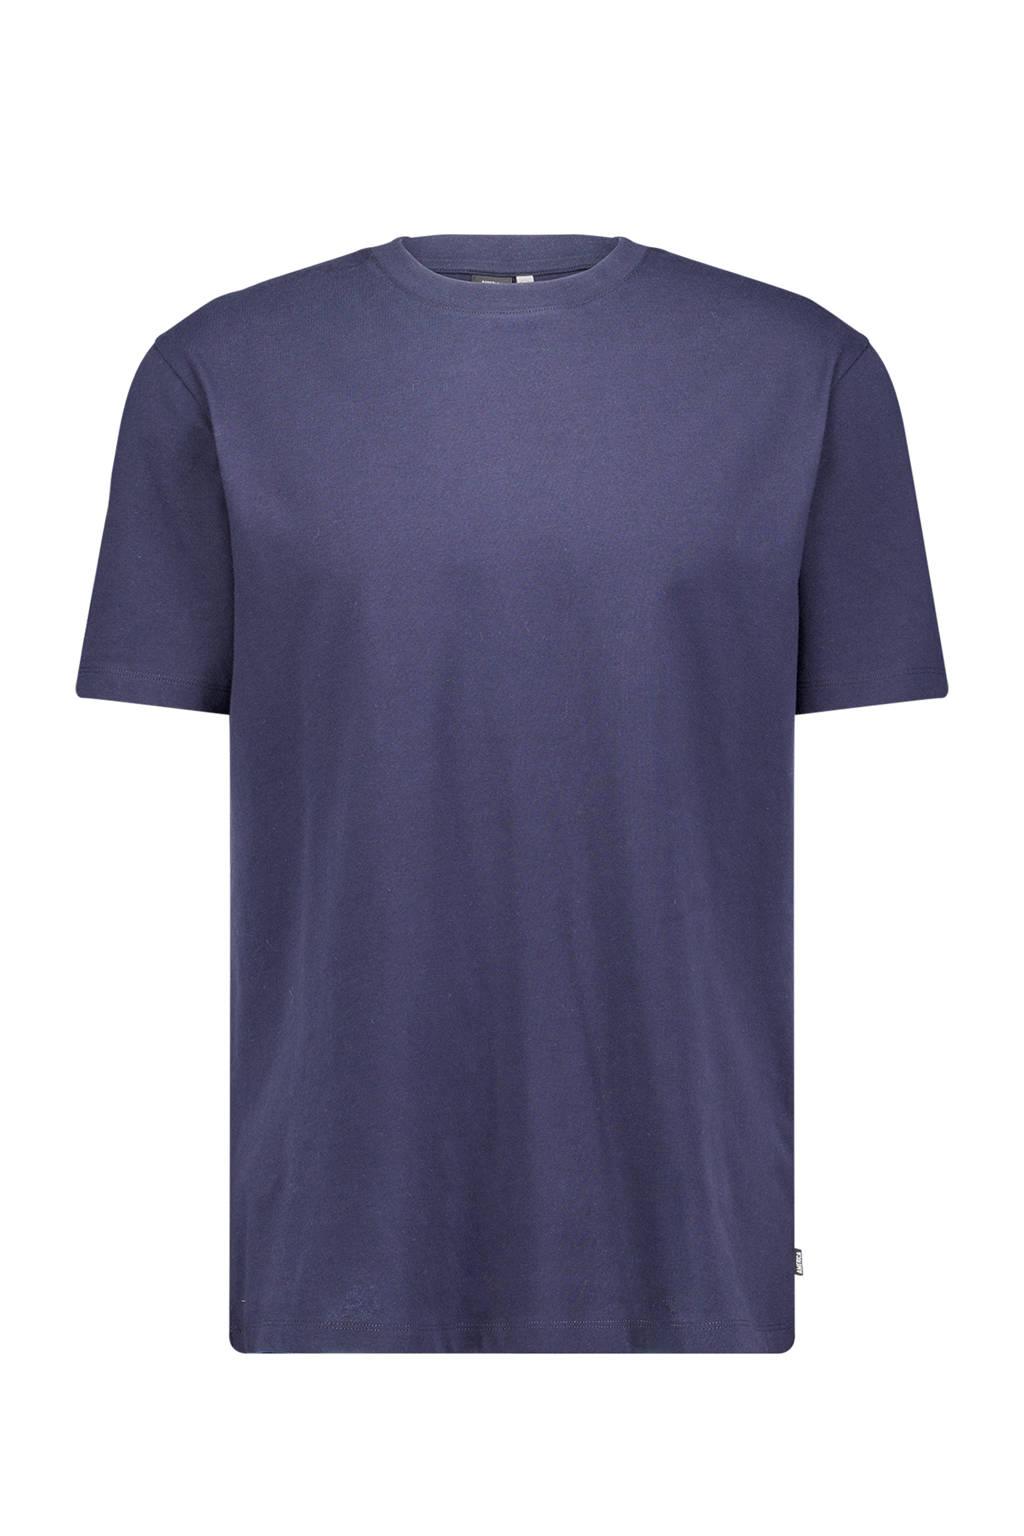 America Today T-shirt Eric van biologisch katoen donkerblauw, Donkerblauw